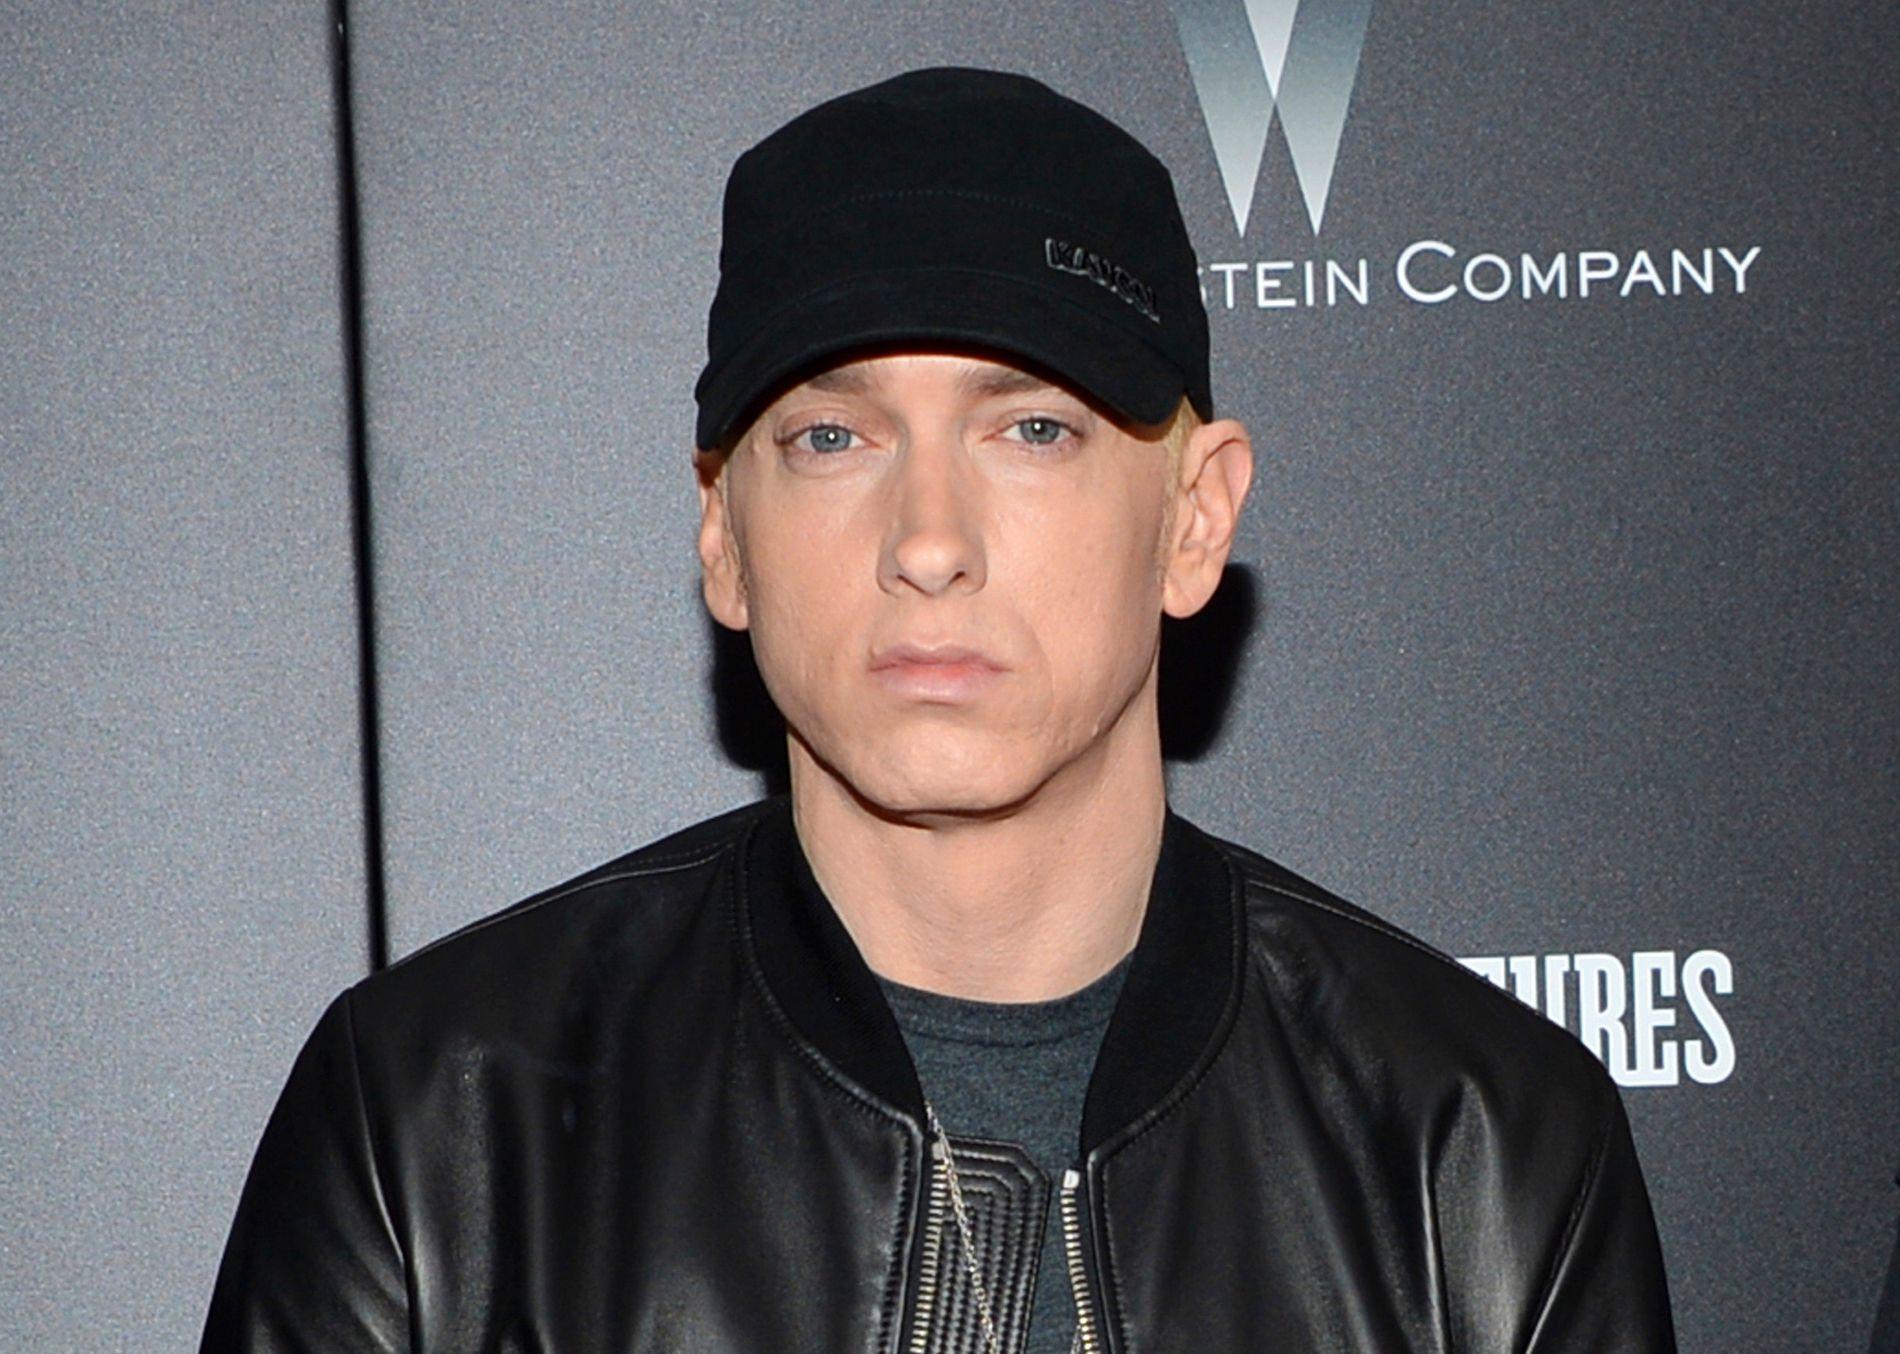 HELOMVENDING: Eminem er ferdig med alkohol, piller og annen dop. Her på en premiere i L.A. i fjor.